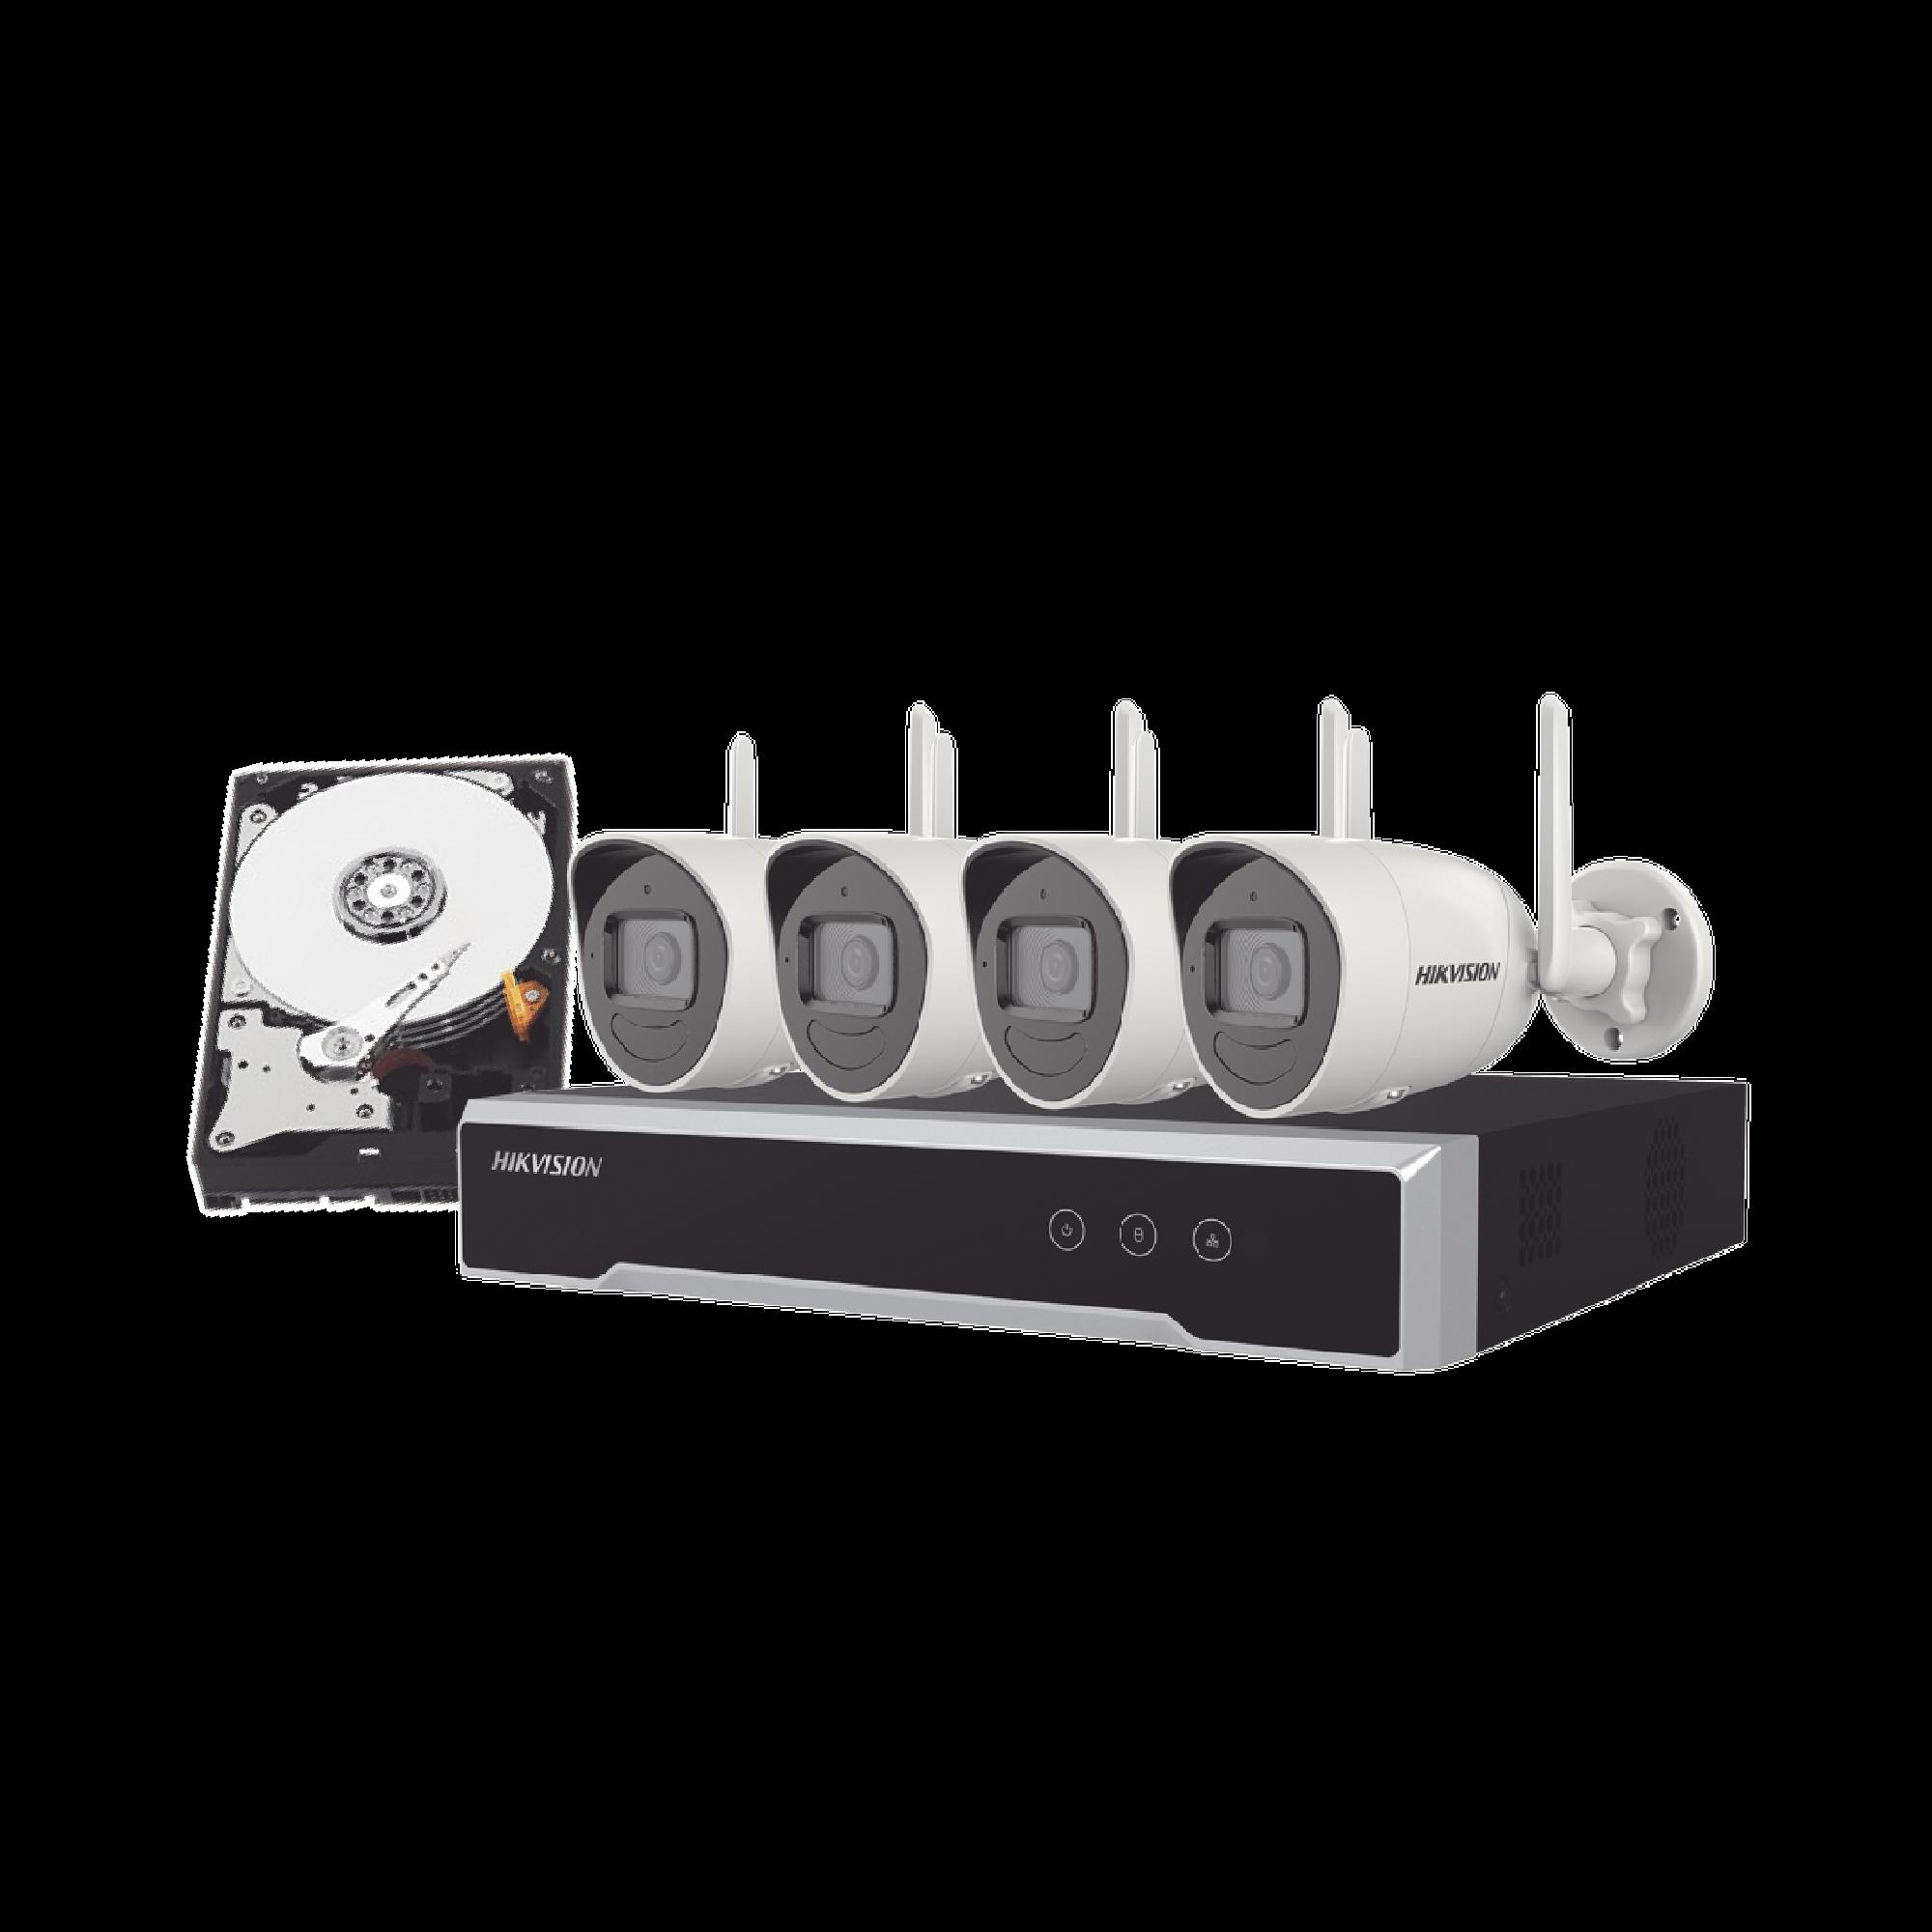 (120 Metros Inalámbricos) Kit IP Inalámbrico 4 Megapixel / NVR 4 Canales / 4 Cámaras Bala para Exterior / 1 HDD de 1 TB / Modo Repetidor